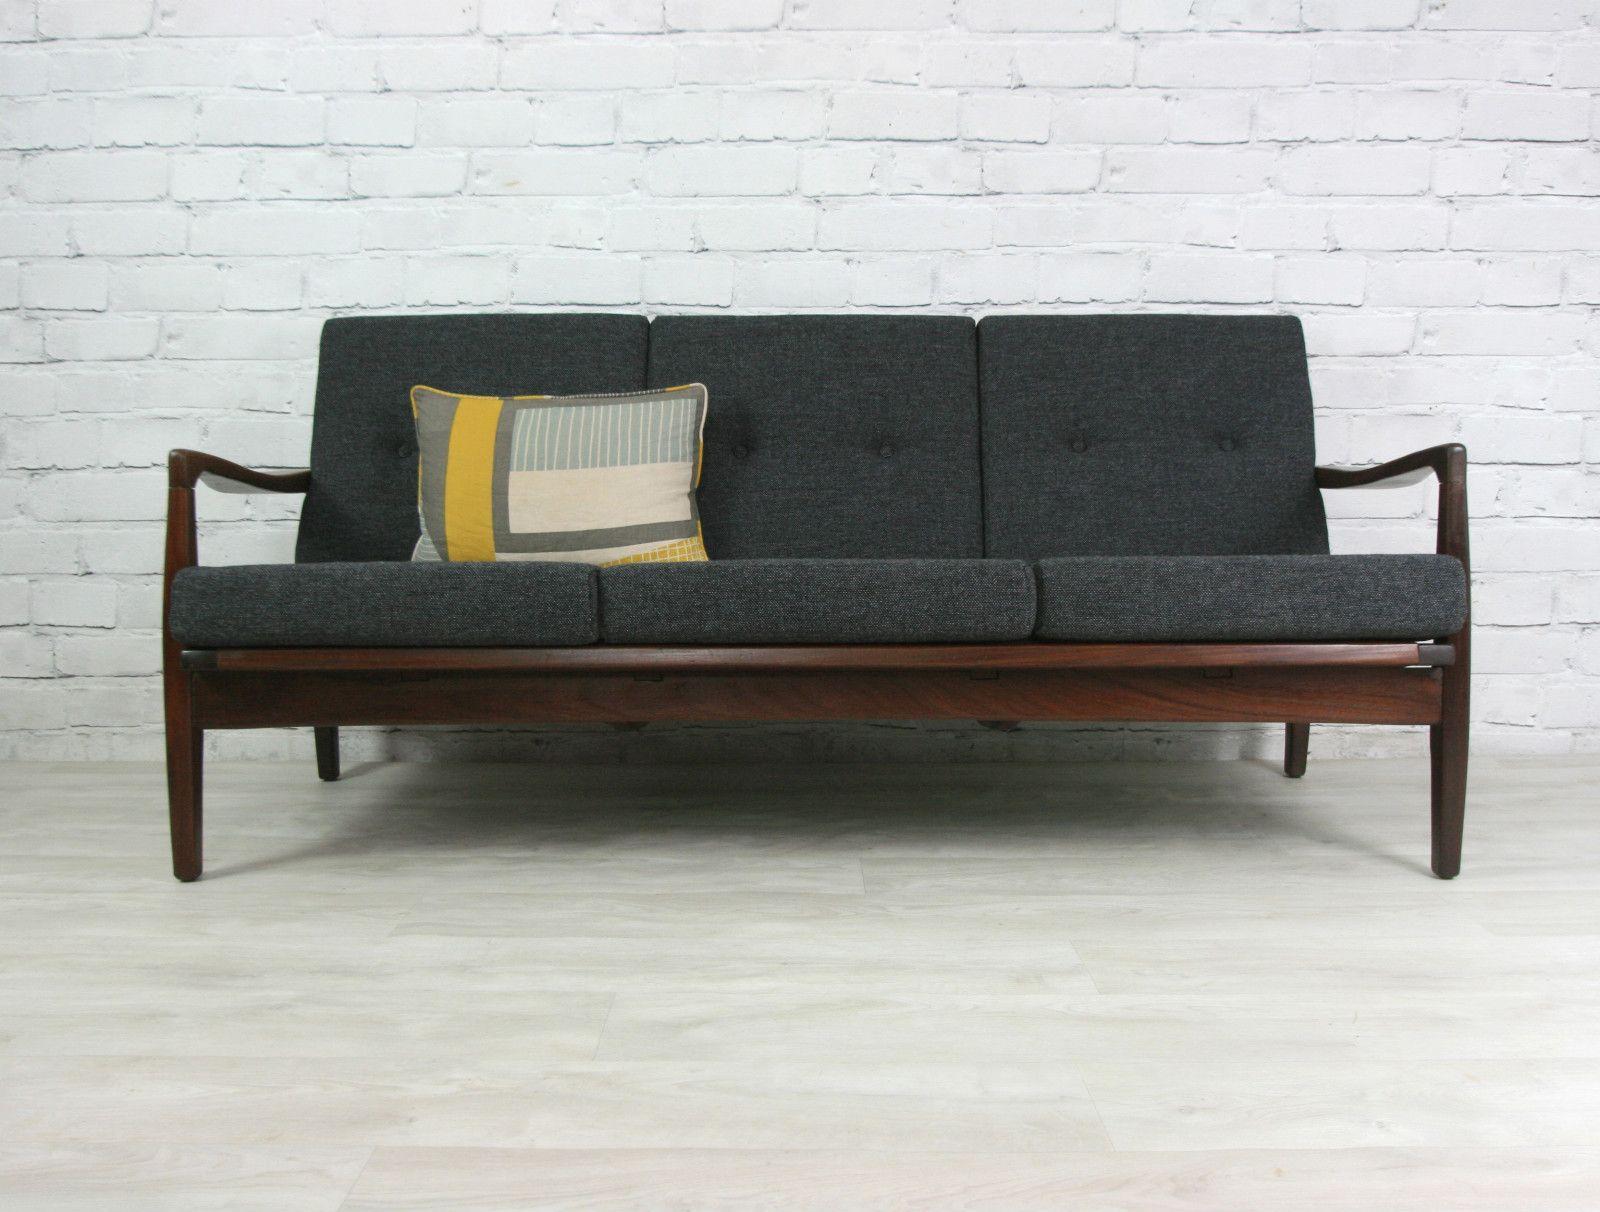 Danish Style Sofa Bed Uk Sleeper Sofas In Houston Tx Retro Vintage Teak Afromosia Mid Century